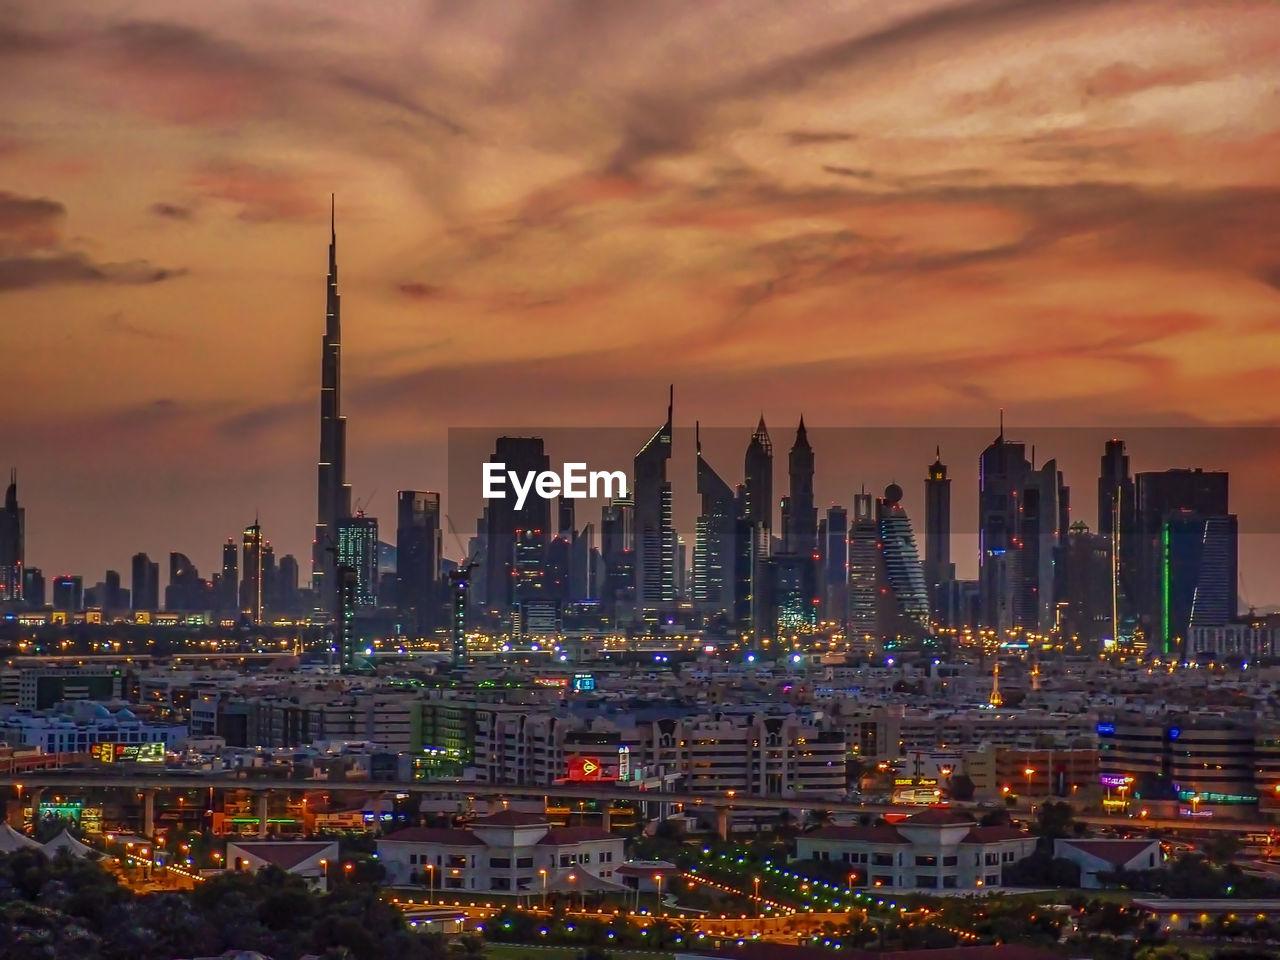 Illuminated Cityscape Against Dramatic Sky During Sunset